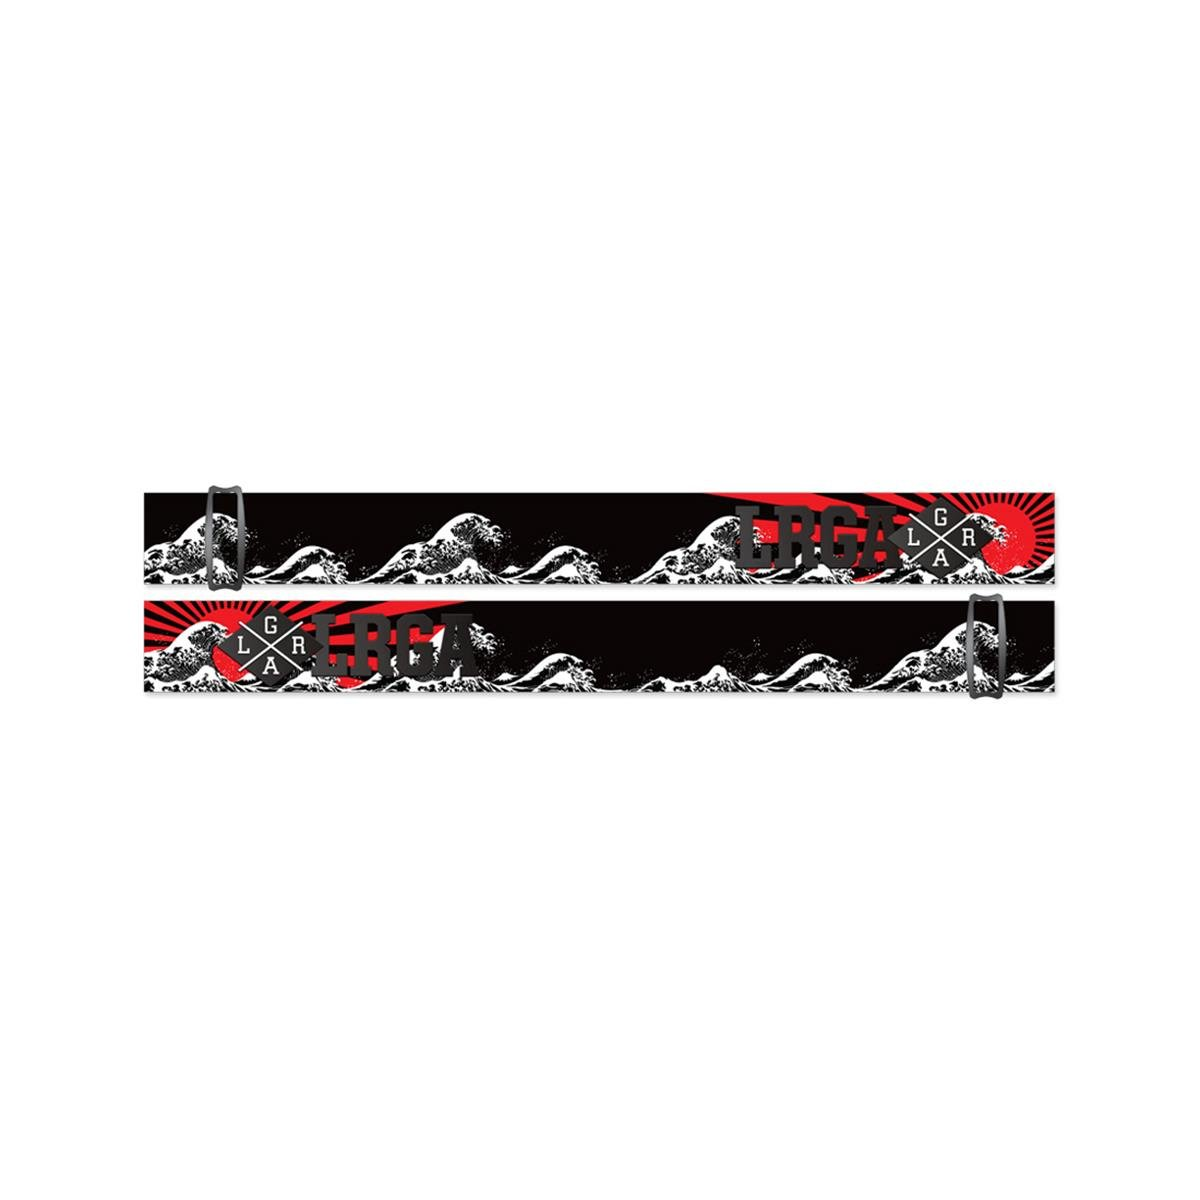 Loose Riders Strap für Crossbrille Cult of Shred Rising Sun - Rot/Schwarz/Weiß